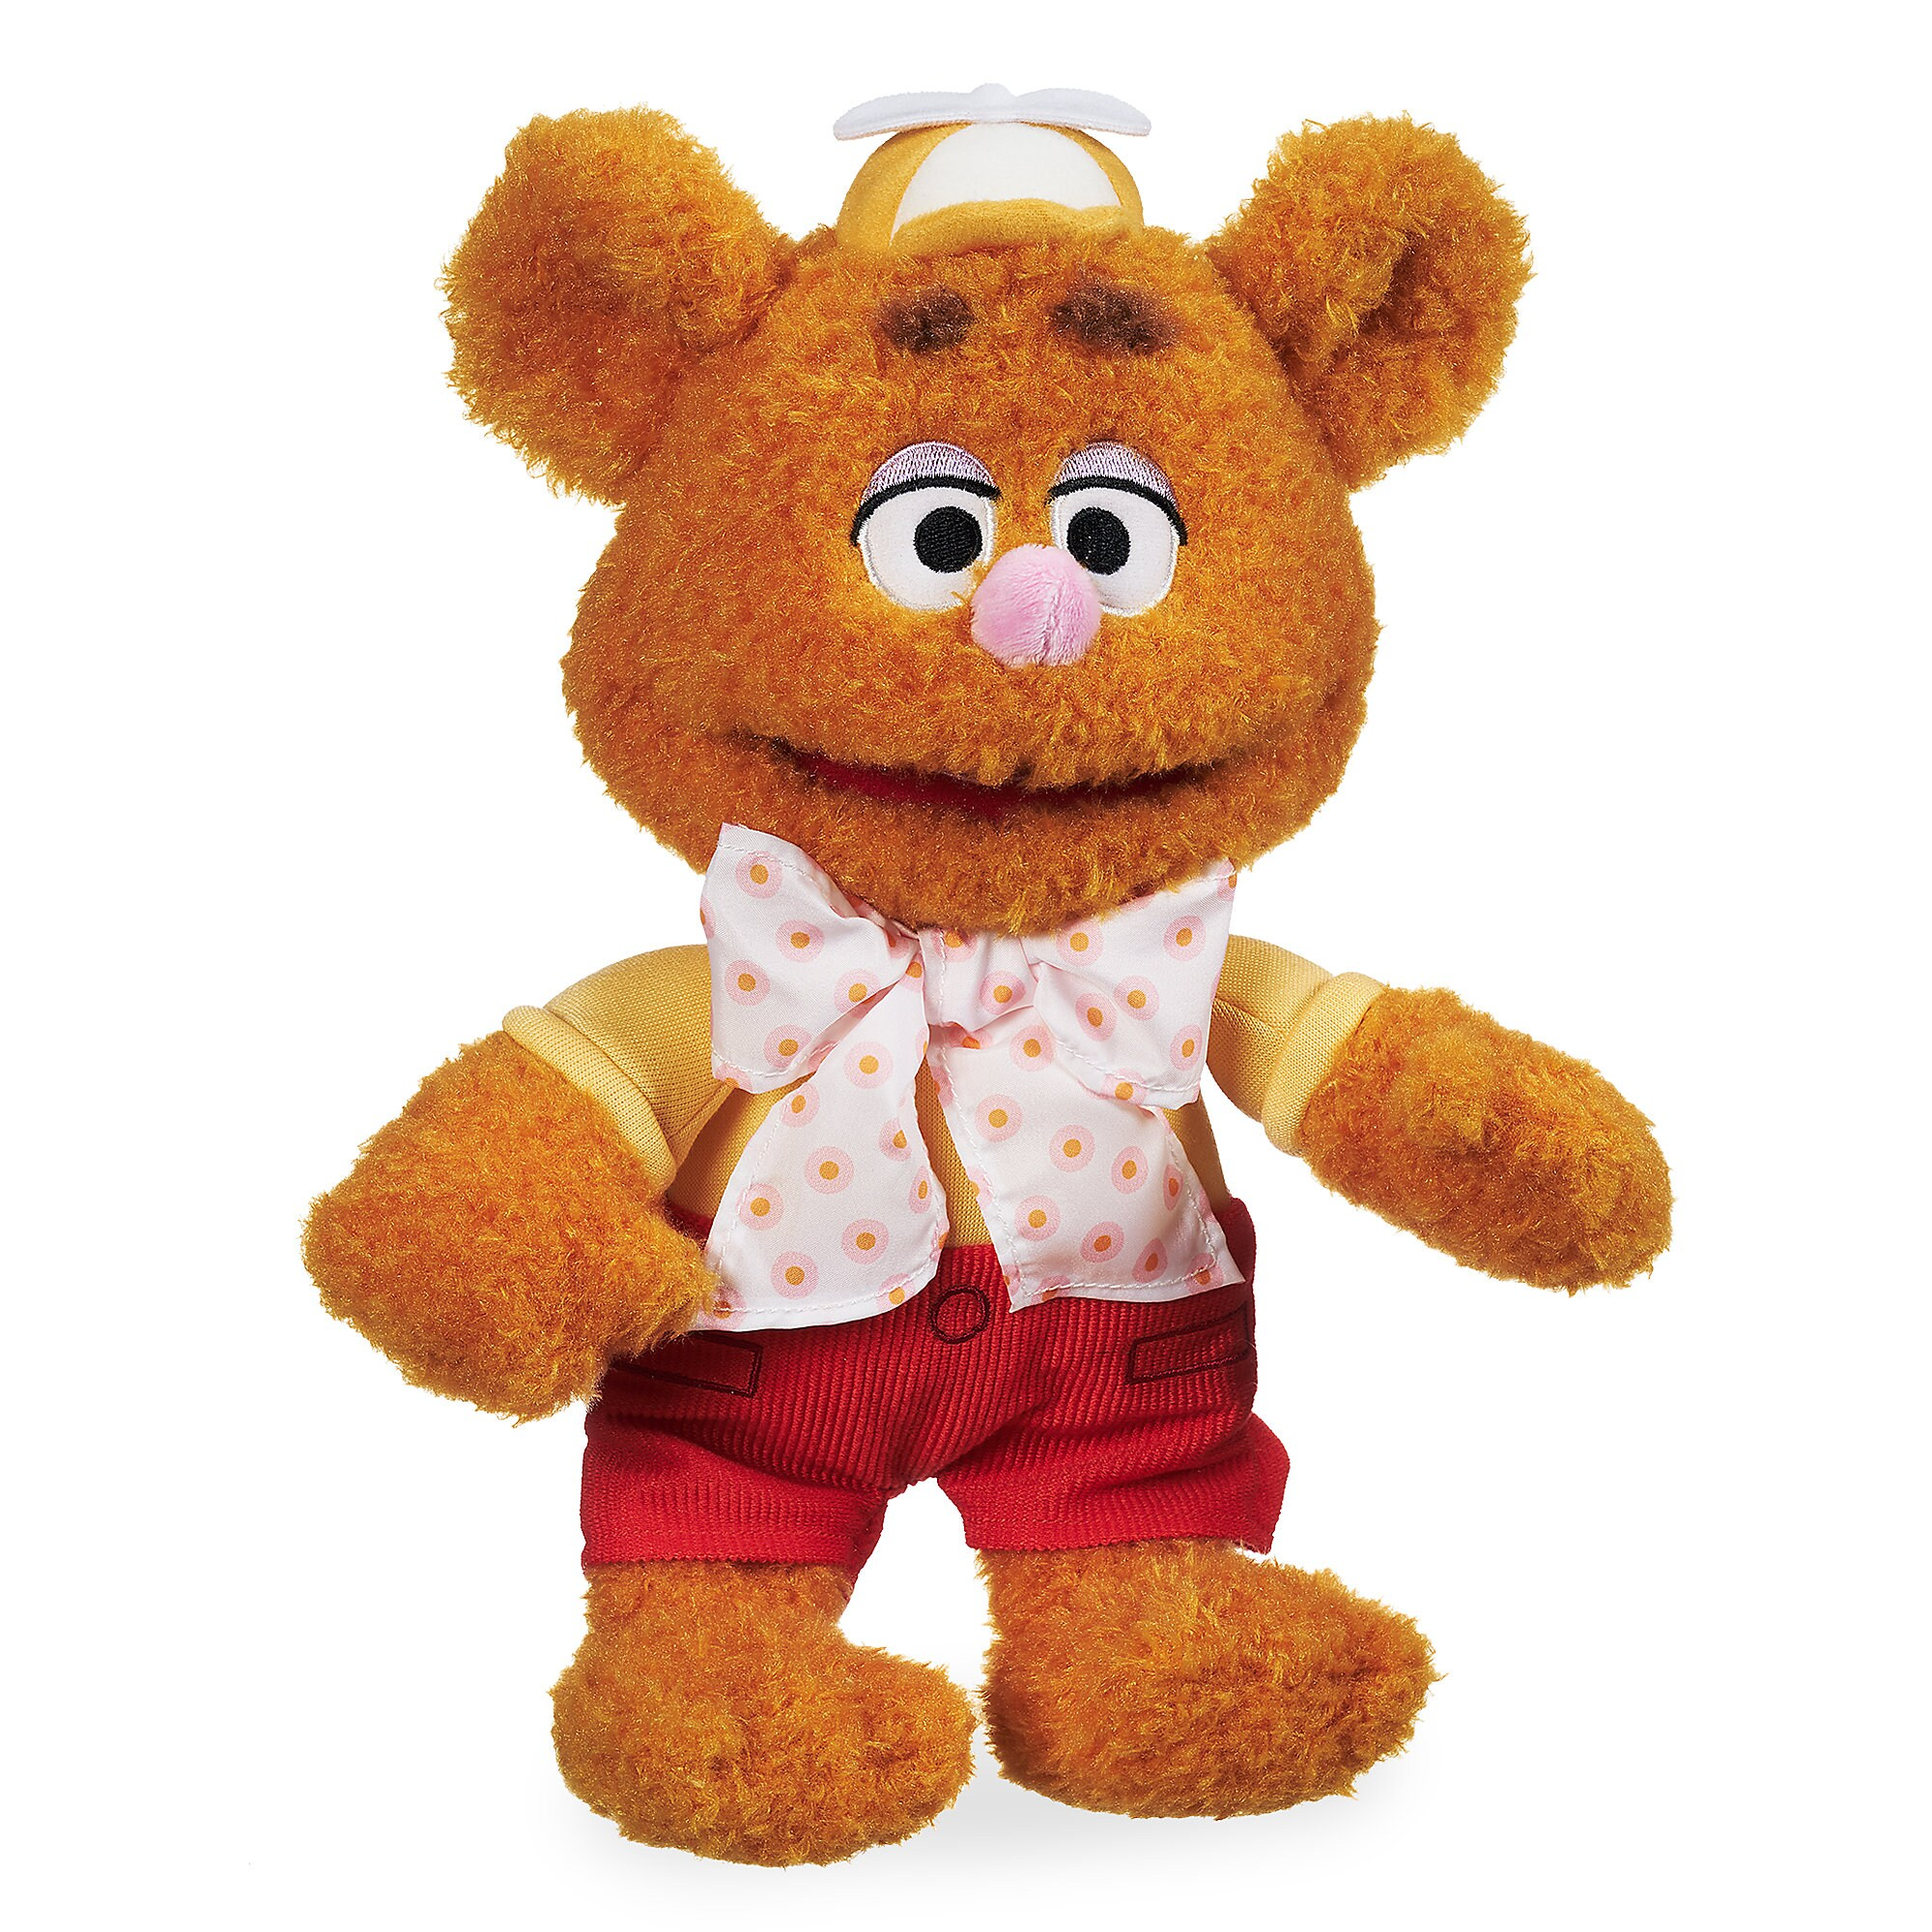 Muppet Babies Toys Ebay